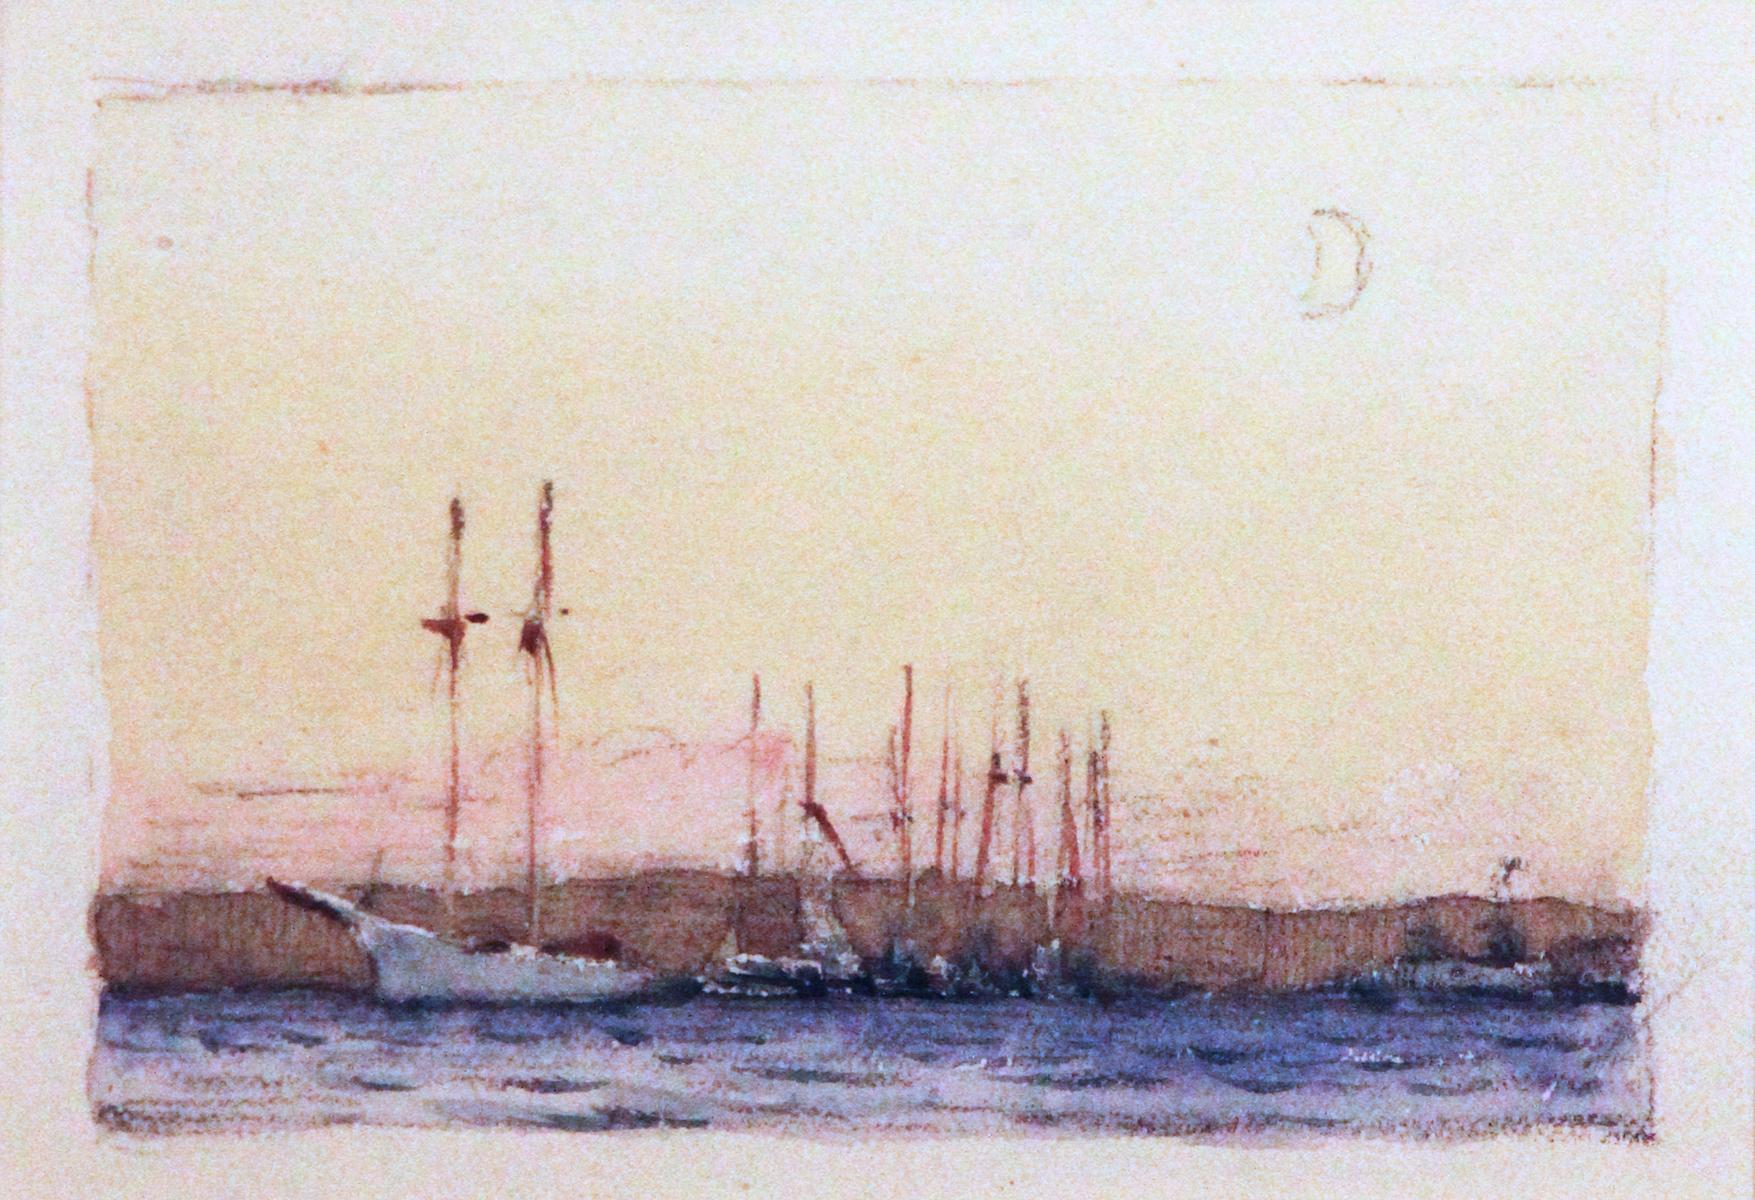 Moonlight Sailboats, American Impressionist, Miniature Watercolor and Pencil